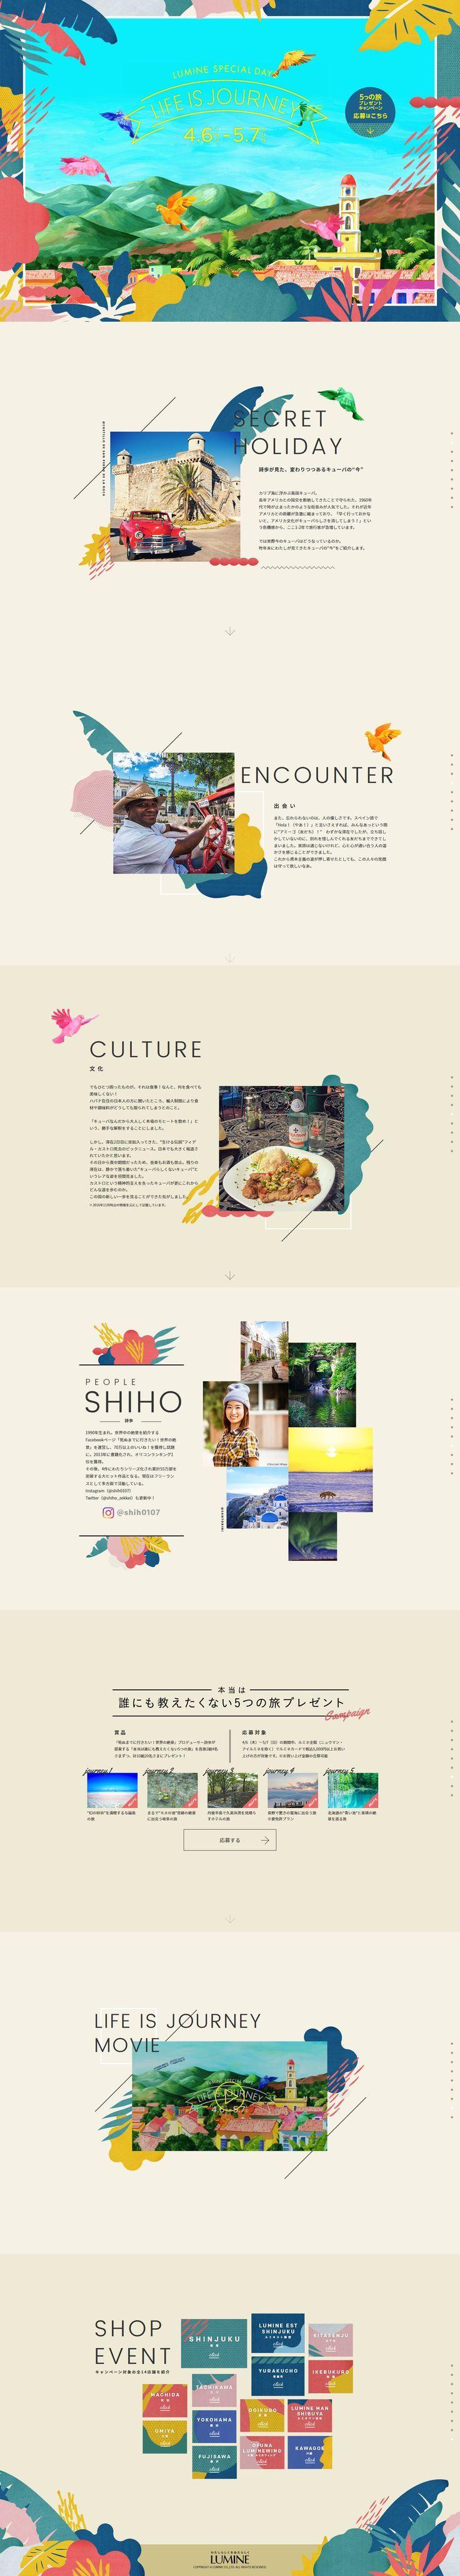 LIFE IS JOURNEY|LUMINE |ルミネ旅 http://www.lumine.ne.jp/journey/: